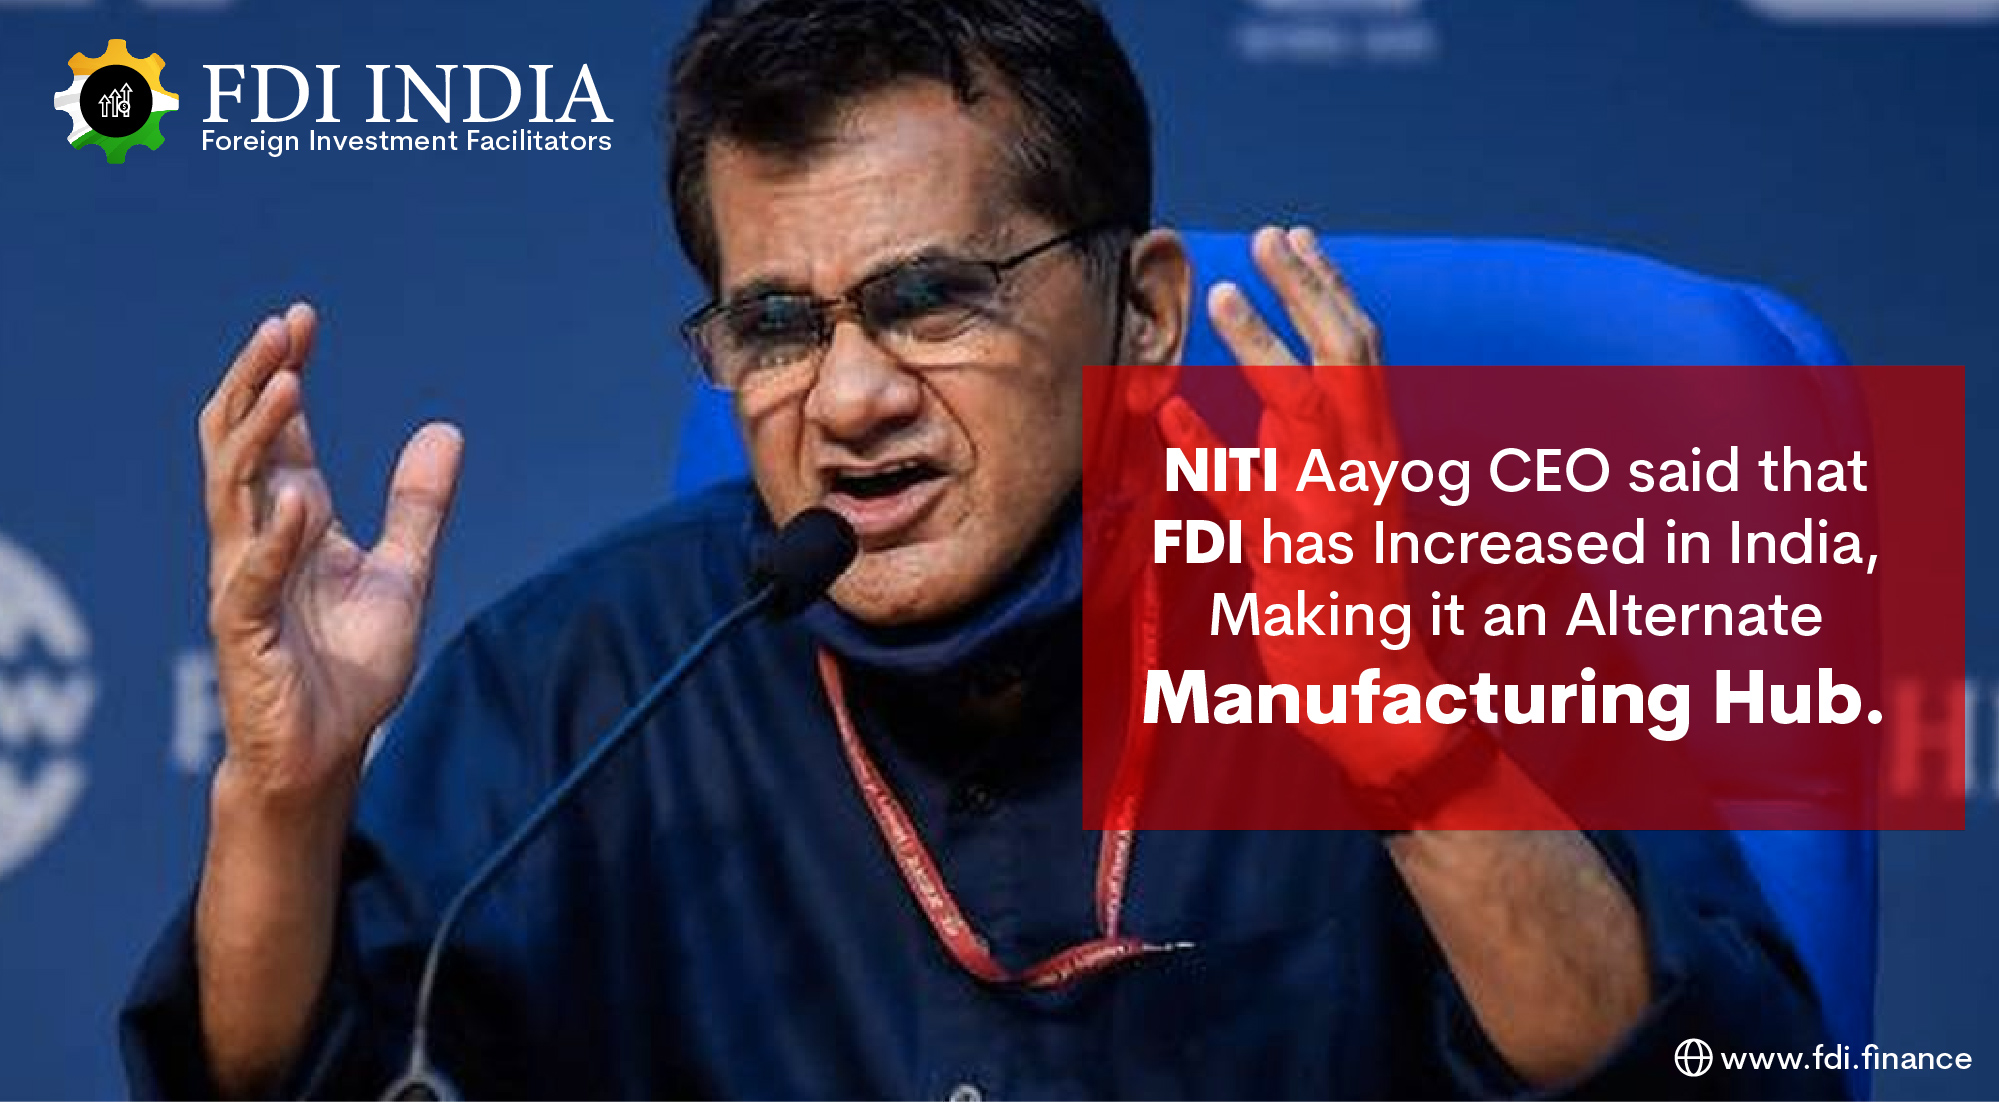 NITI Aayog CEO said that FDI has Increased in India, Making it an Alternate Manufacturing Hub.